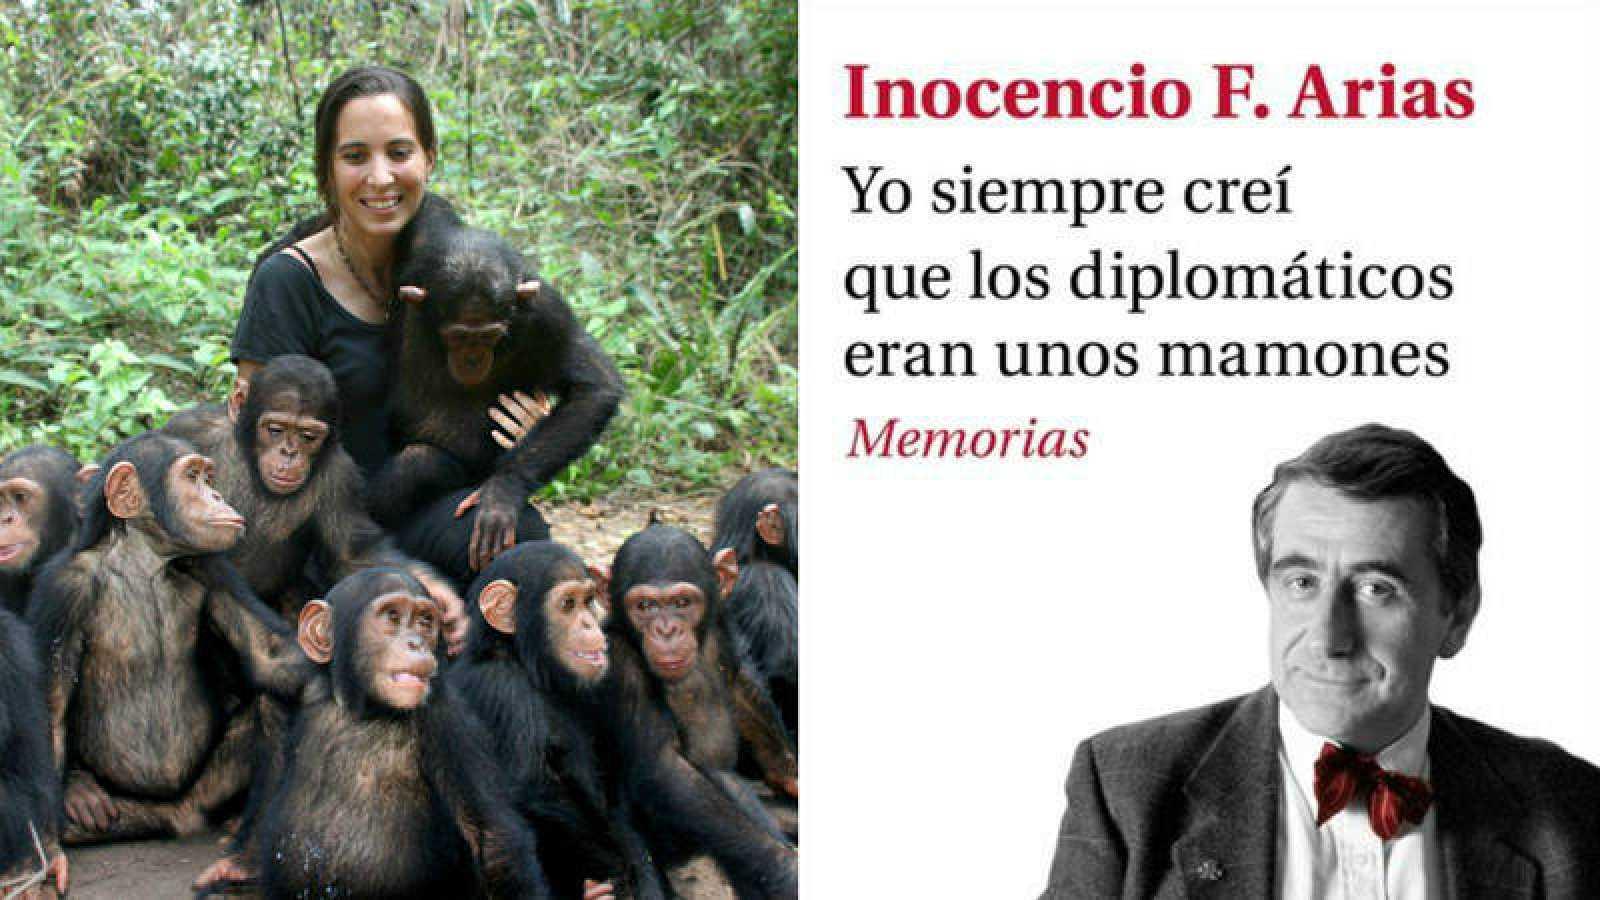 Rebeca Atencia e Inocencio Arias